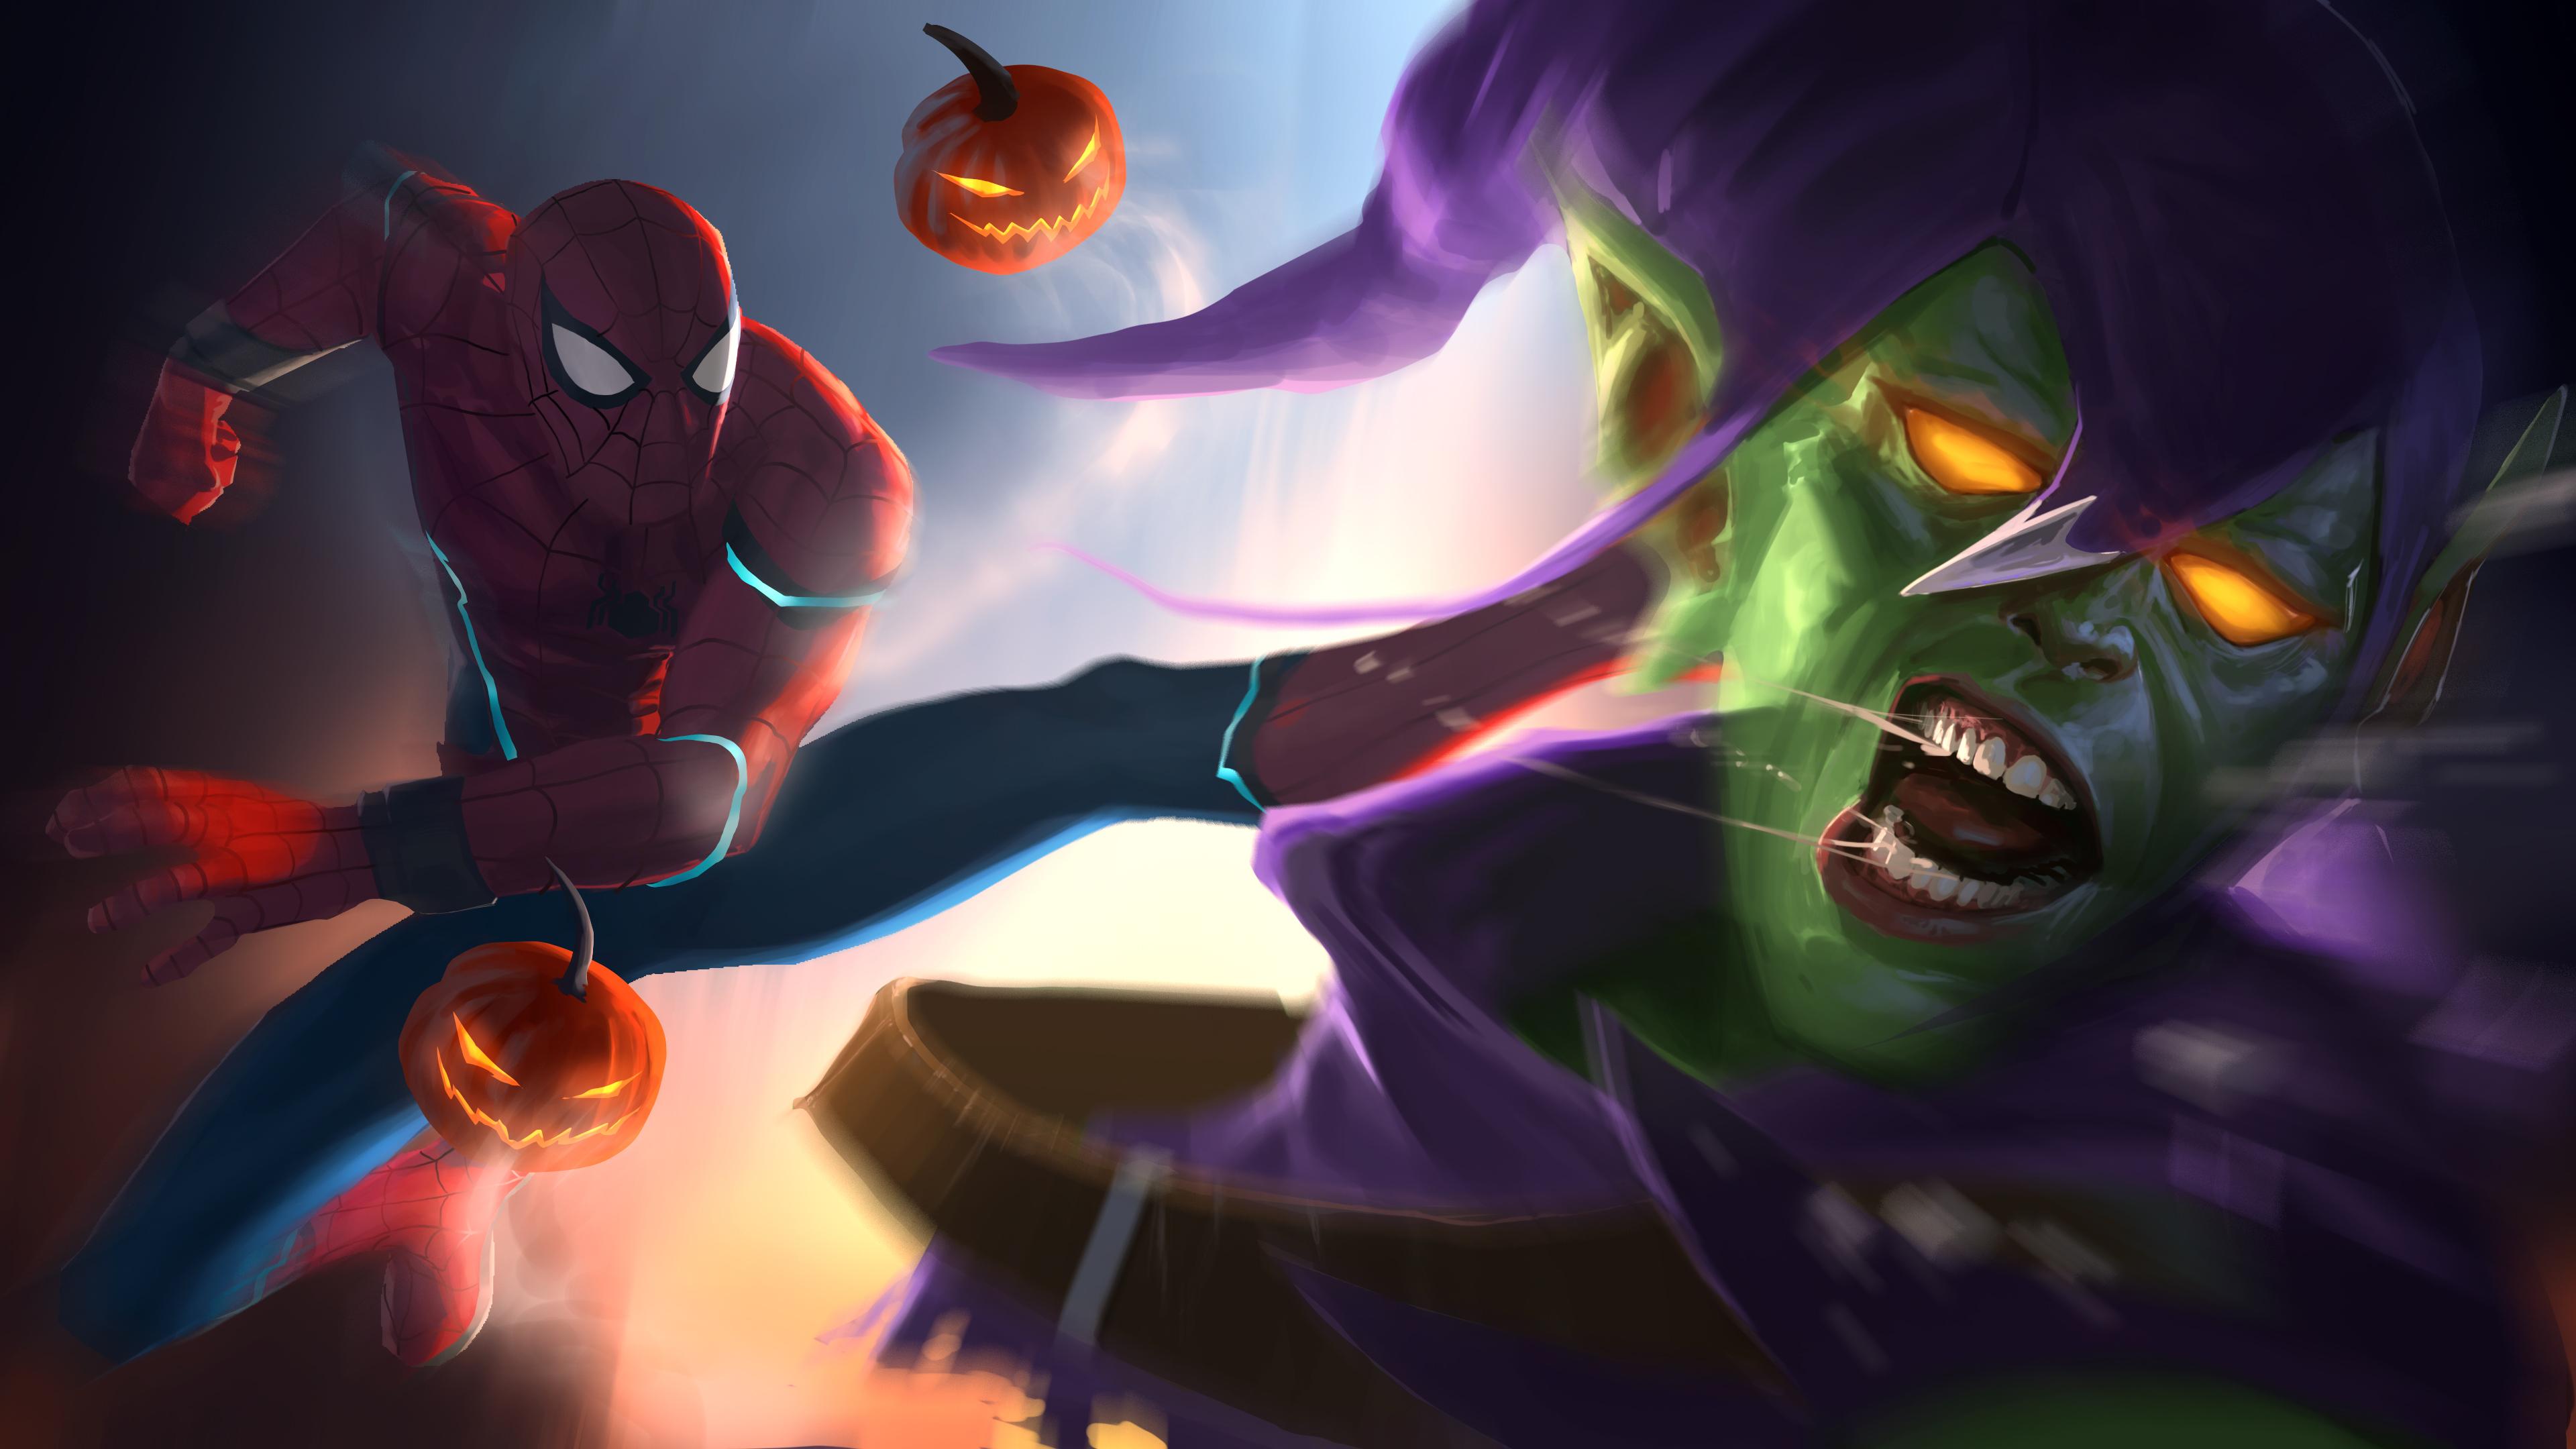 2560x1440 spiderman kicking goblin 1440p resolution hd 4k - Moving spider desktop ...